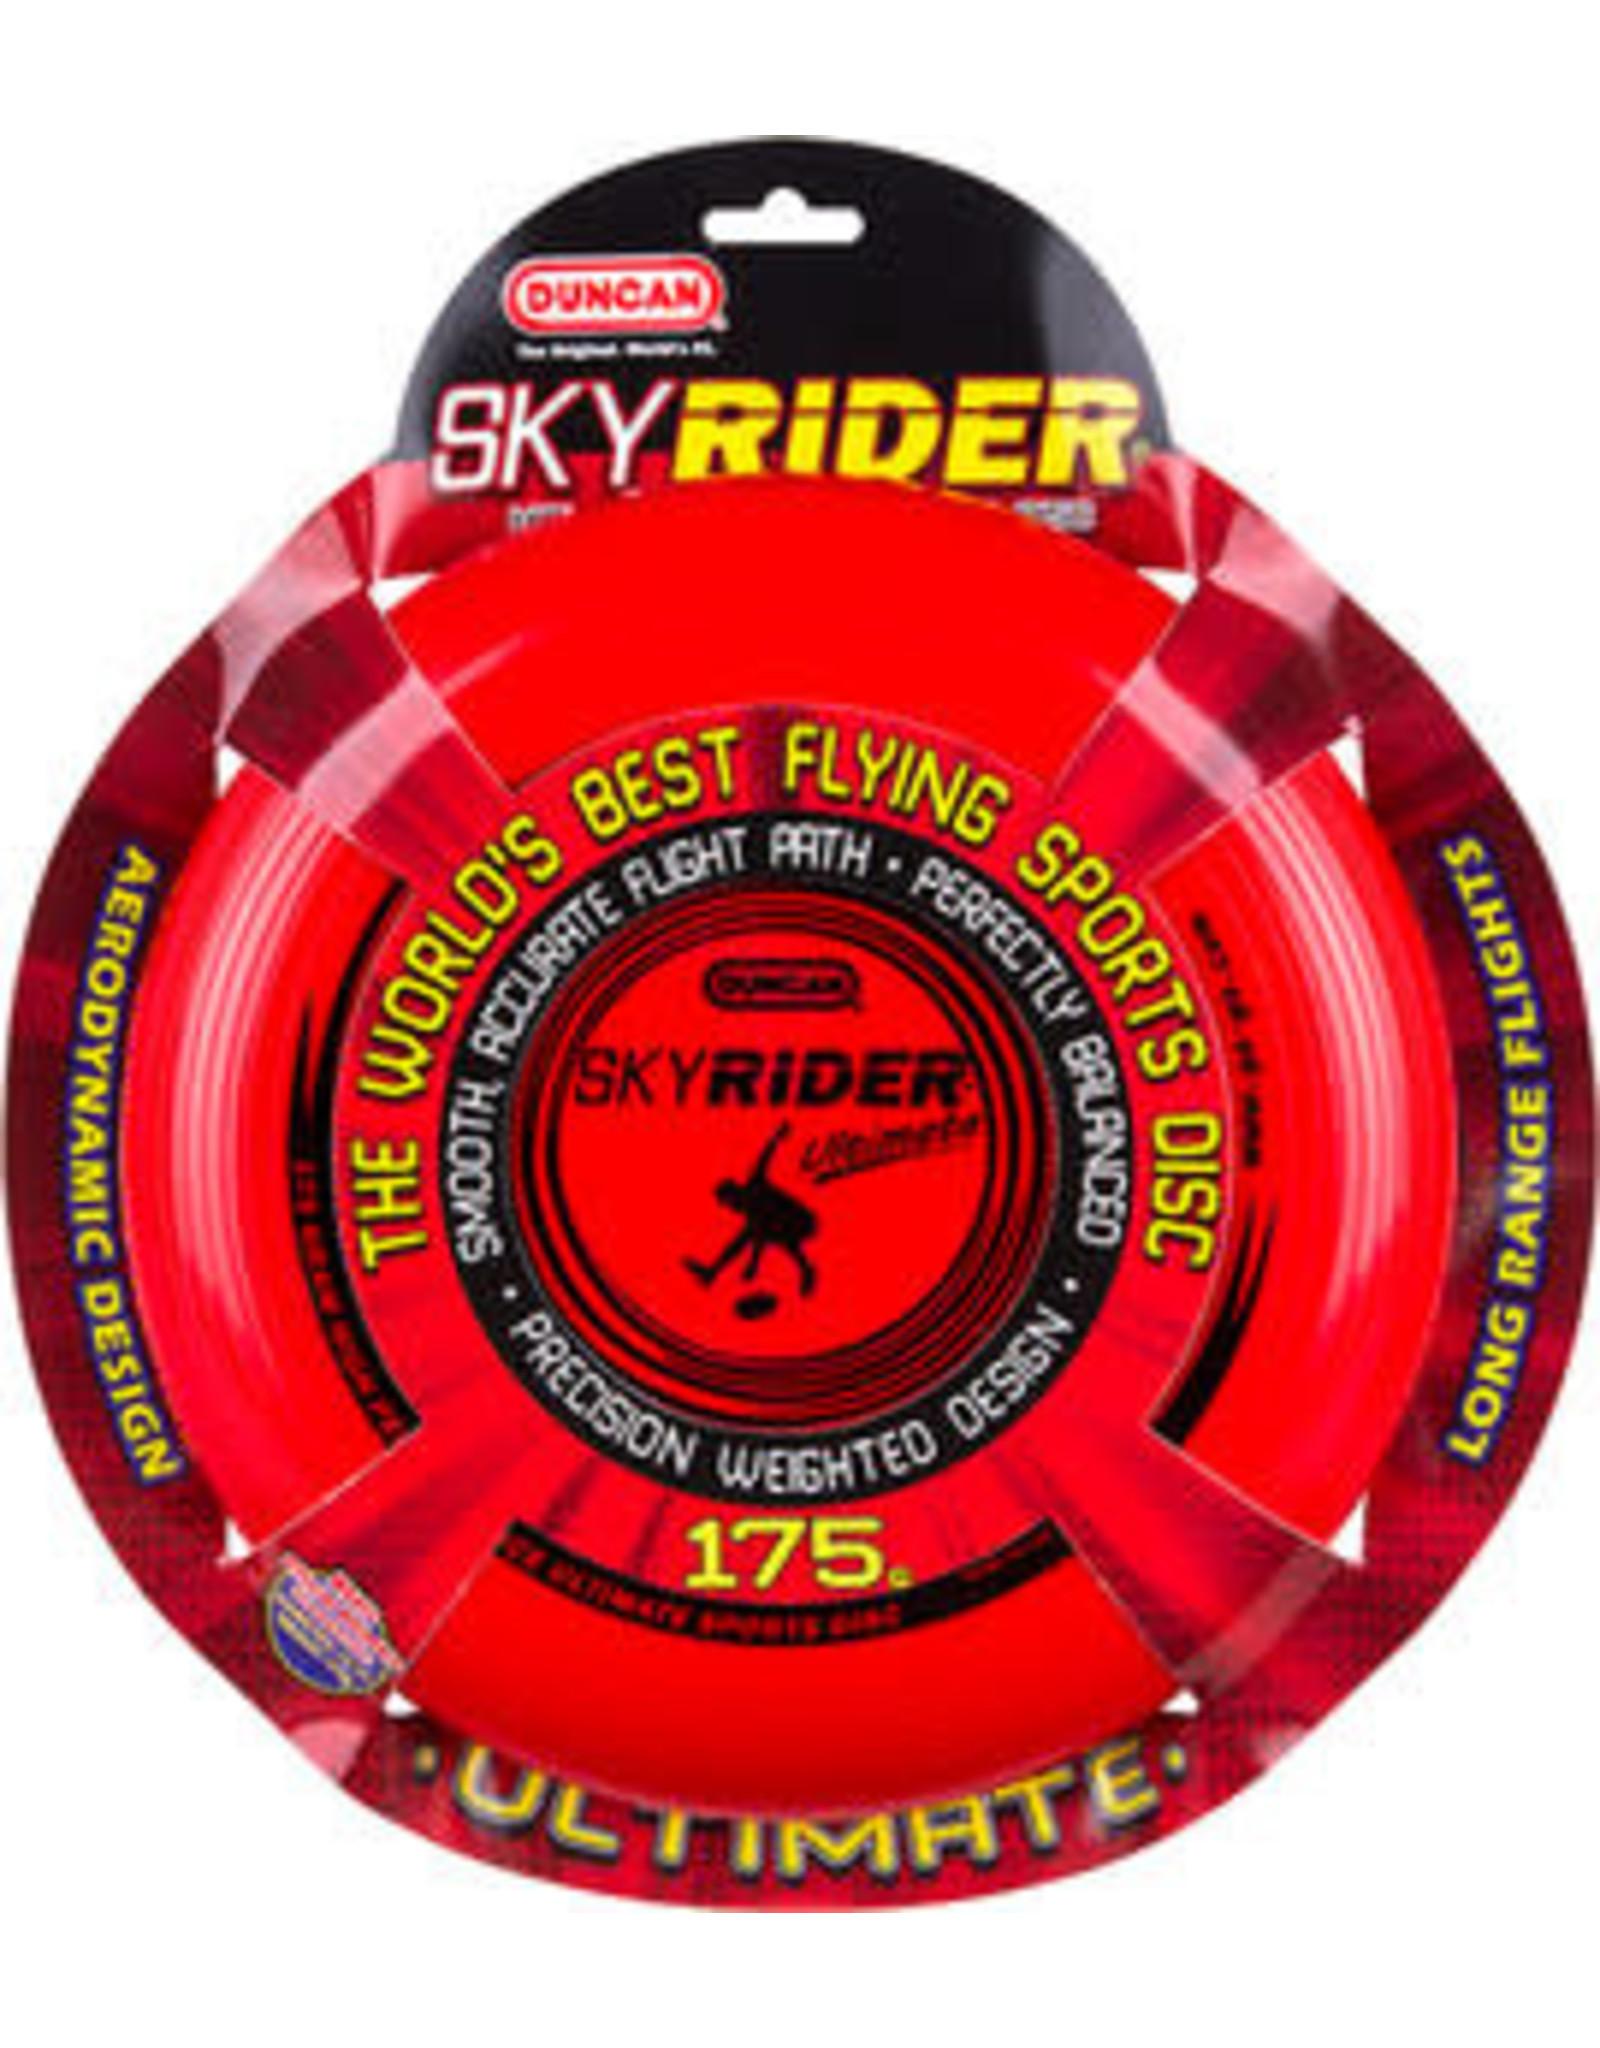 Duncan Sky Rider Ultimate Disc